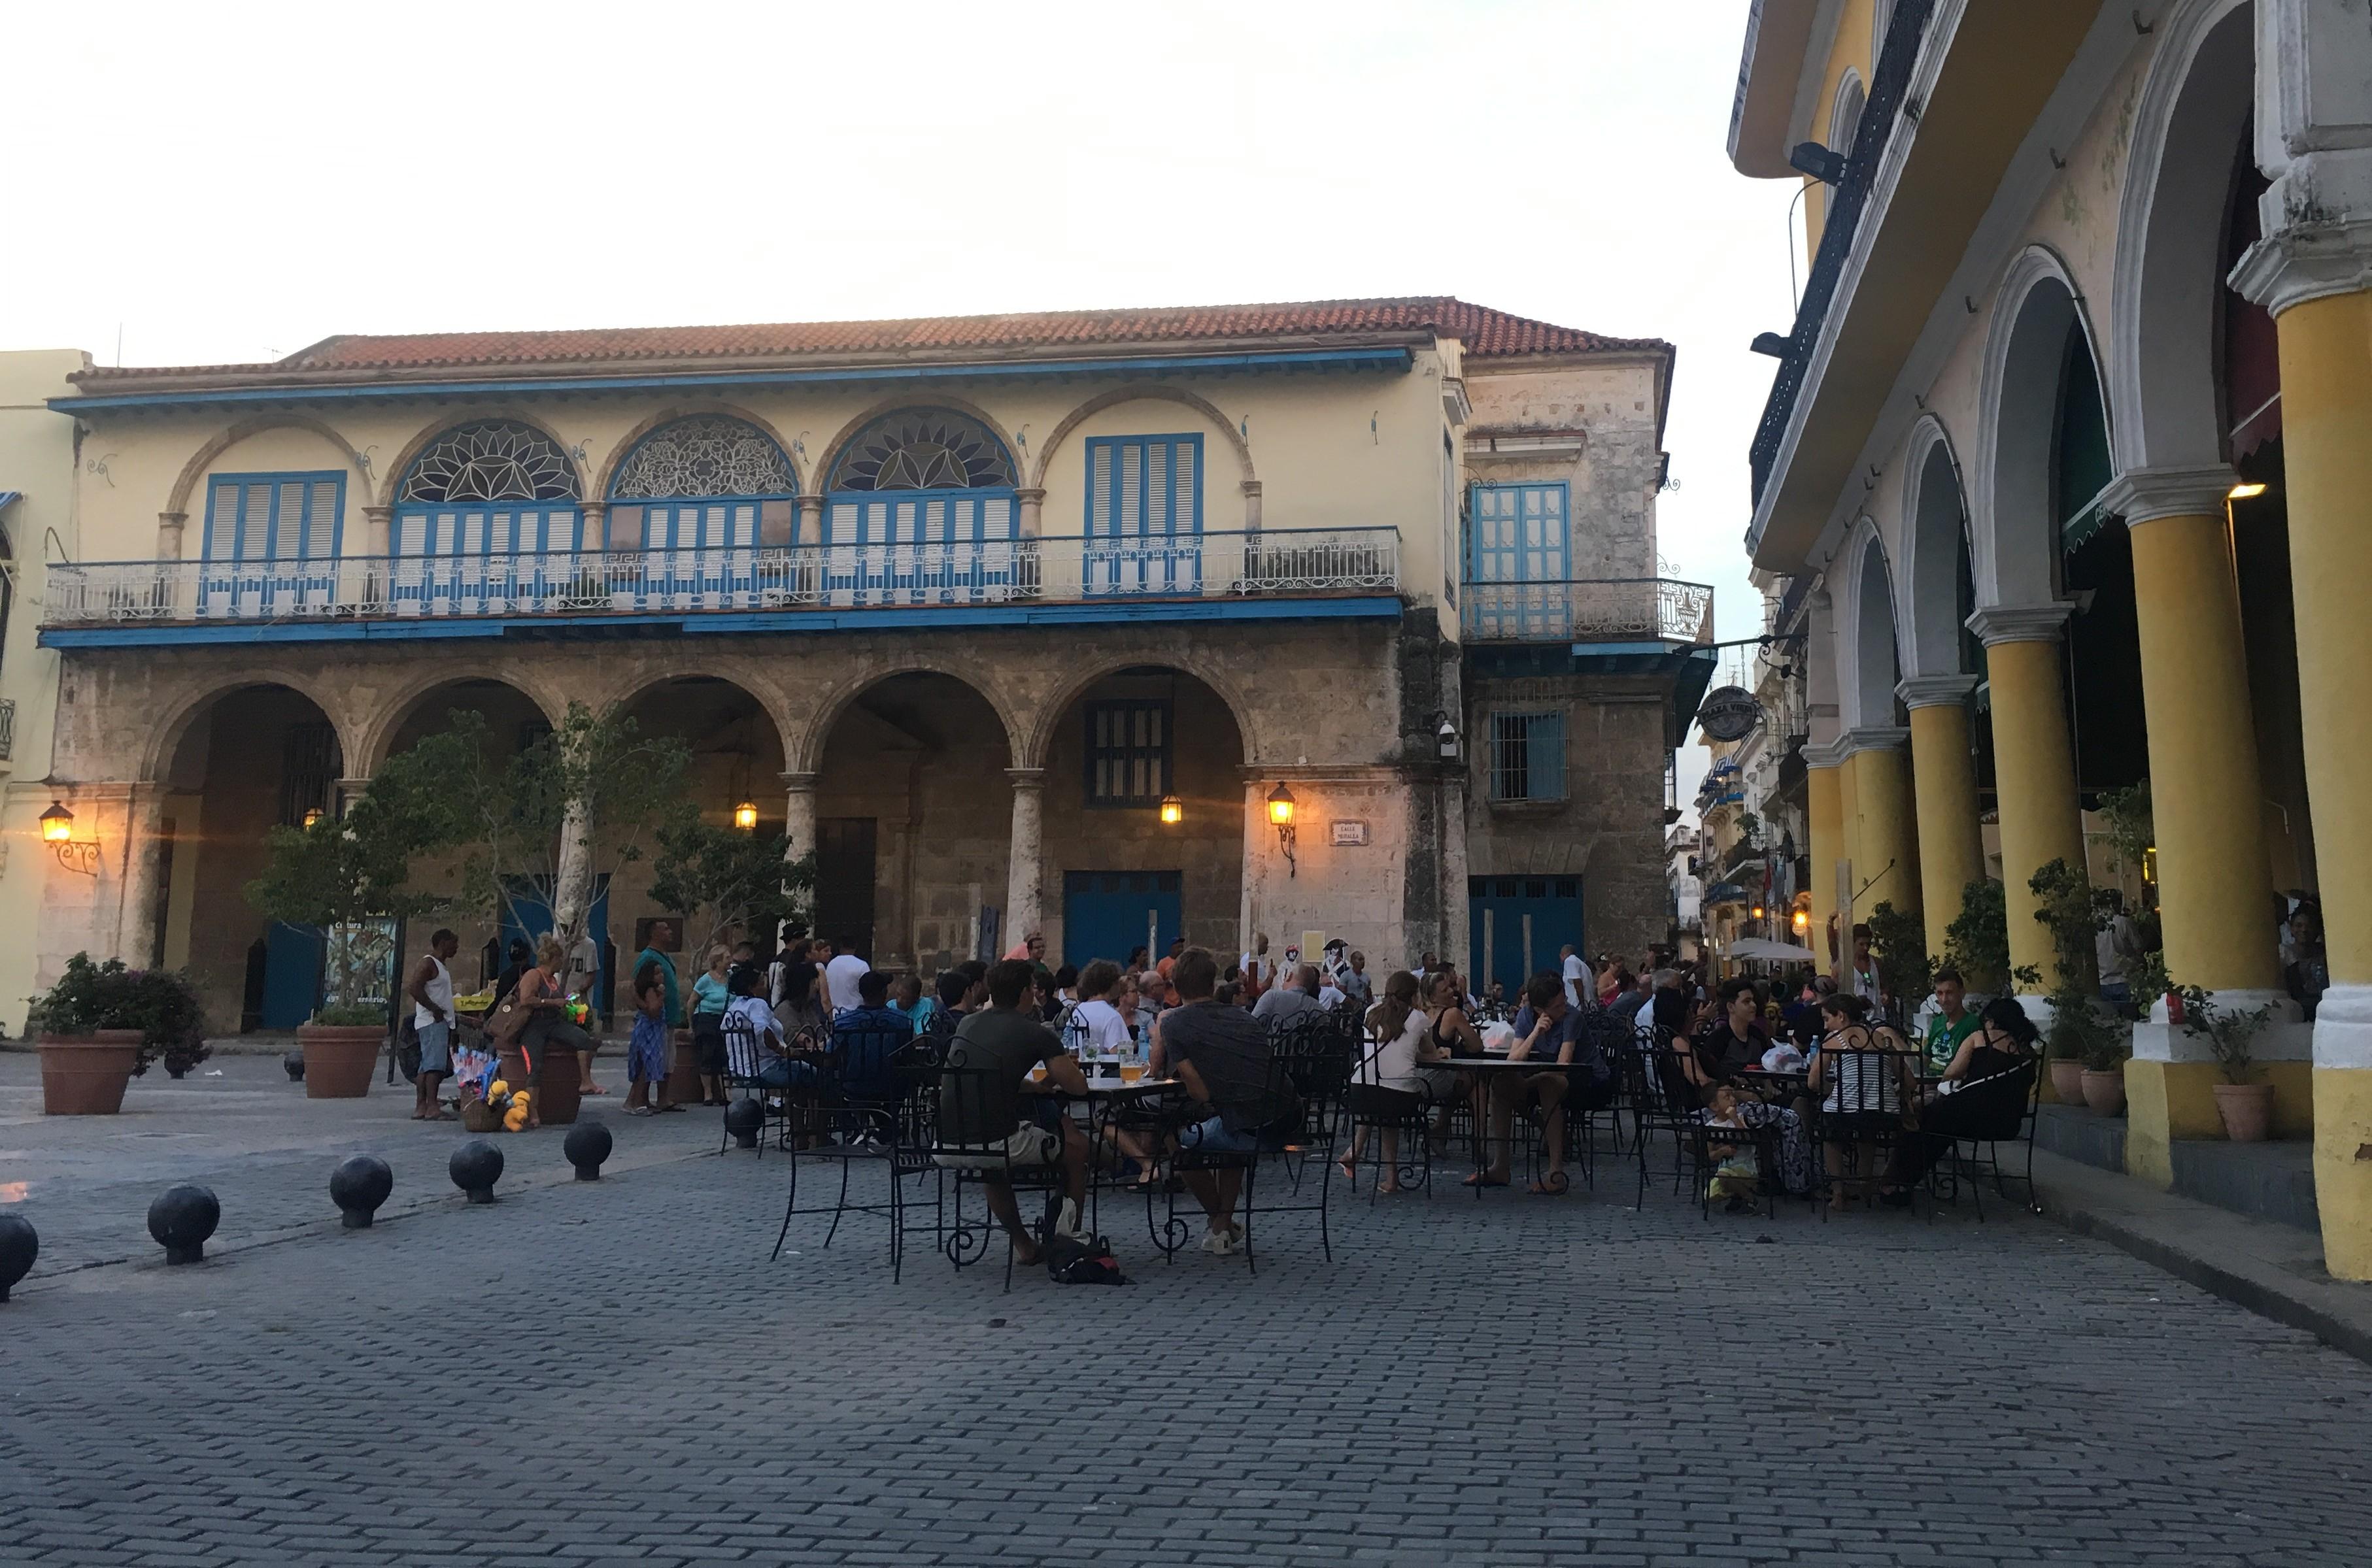 Cuba - Havana Plaza Vieja